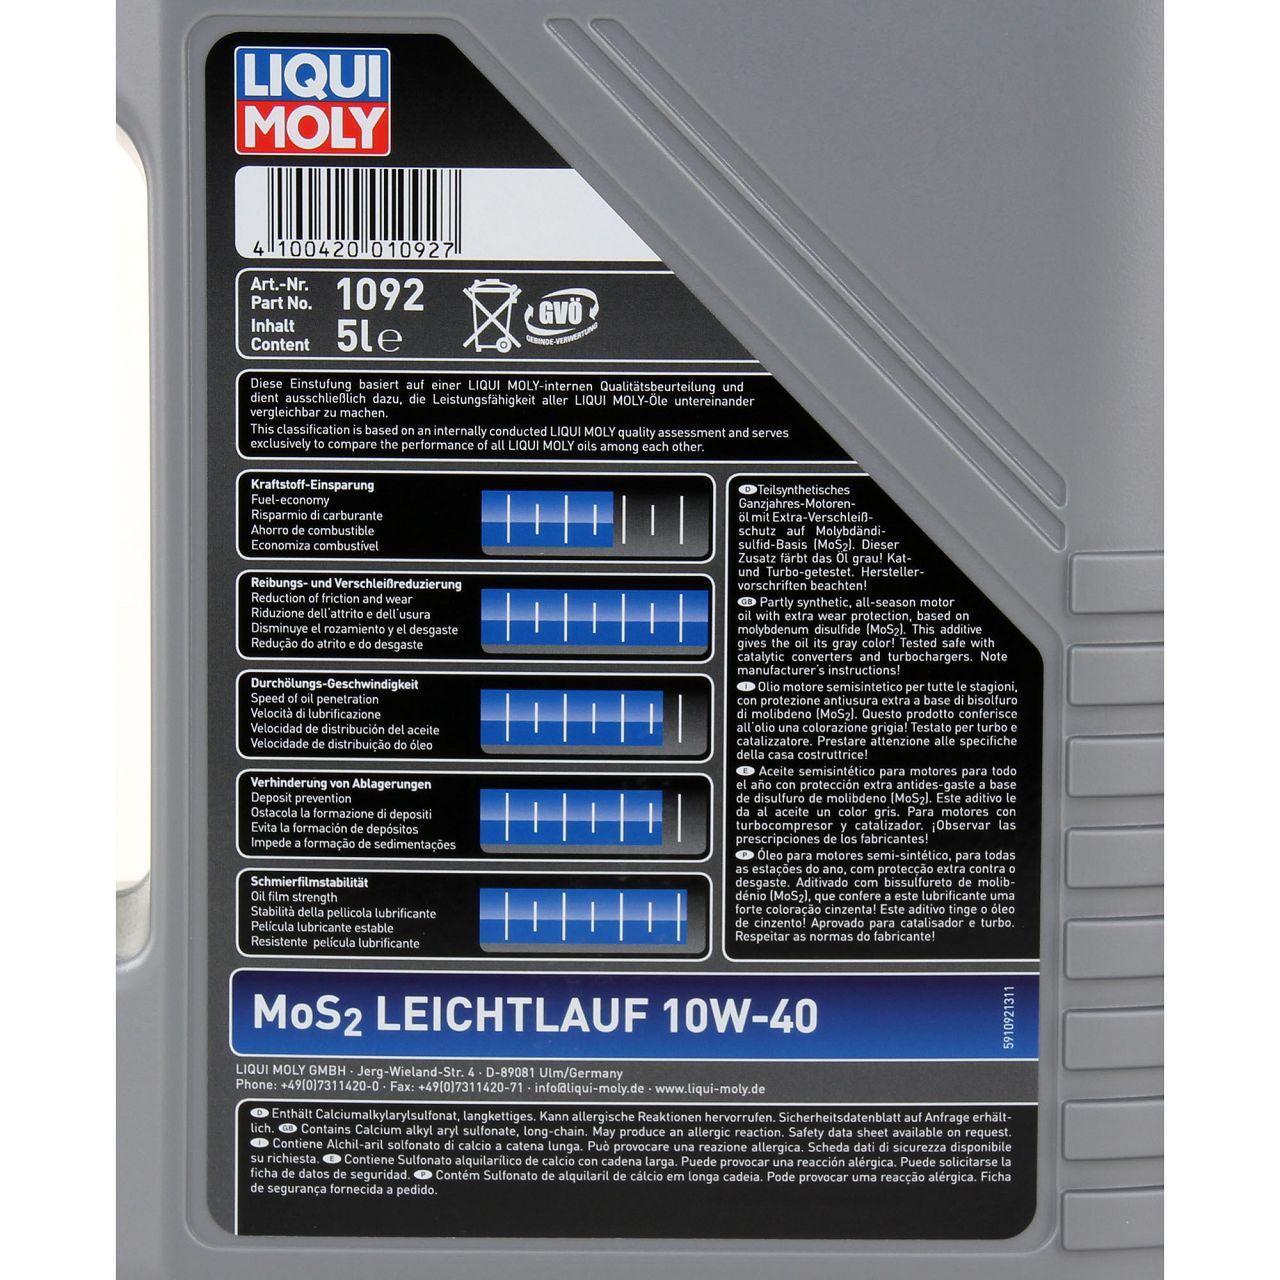 LIQUI MOLY Motoröl Öl MoS2 LEICHTLAUF 10W40 10W-40 5L 5 Liter 1092